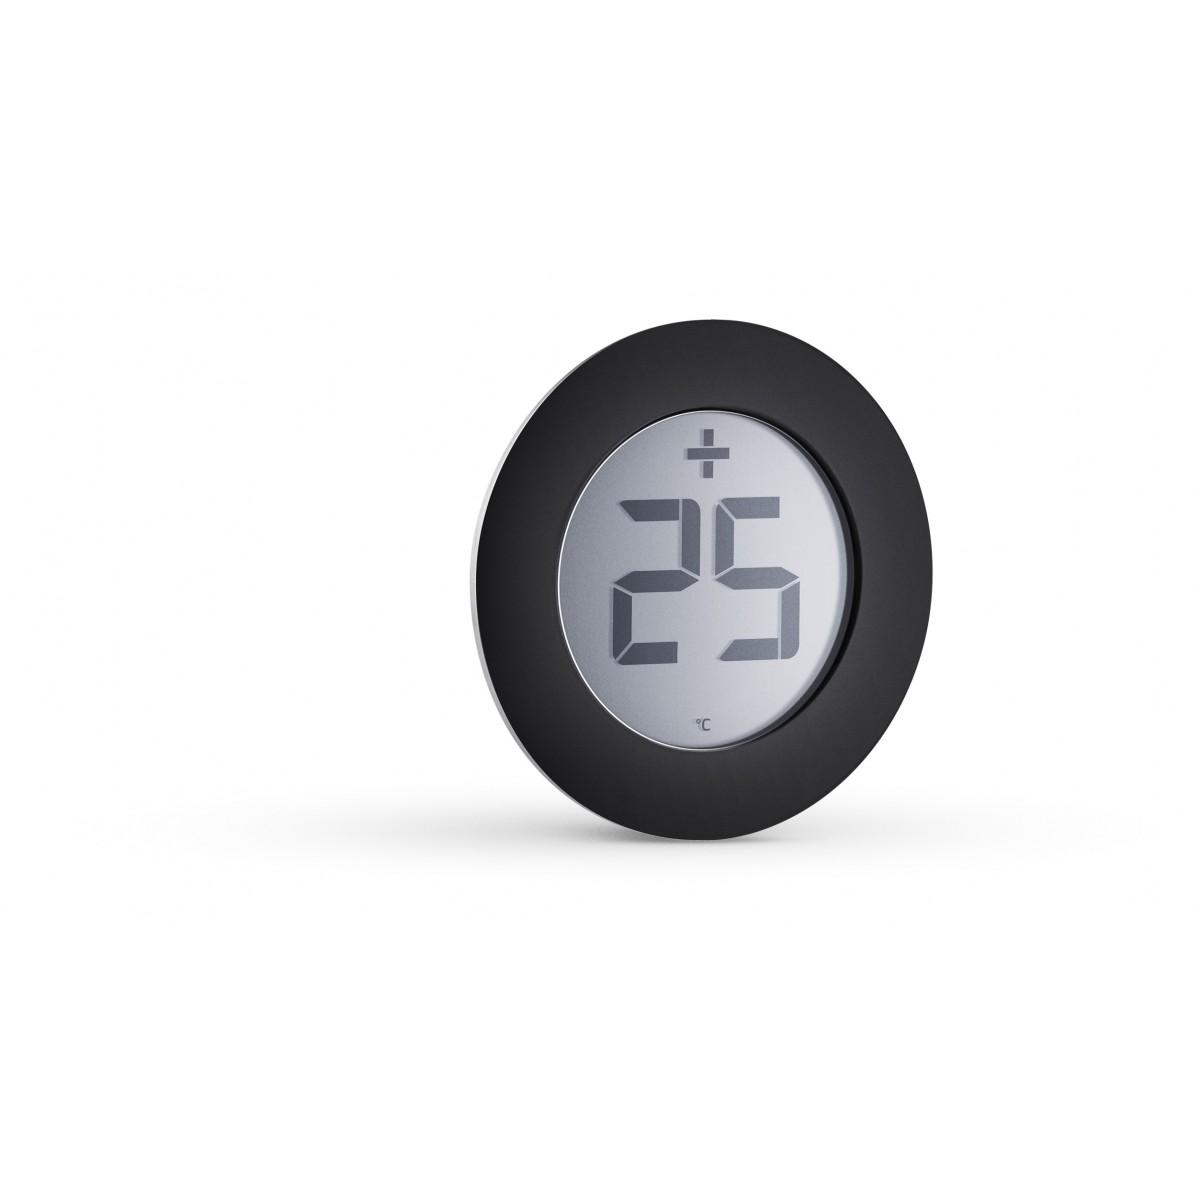 EVA SOLO Digitalt termometer